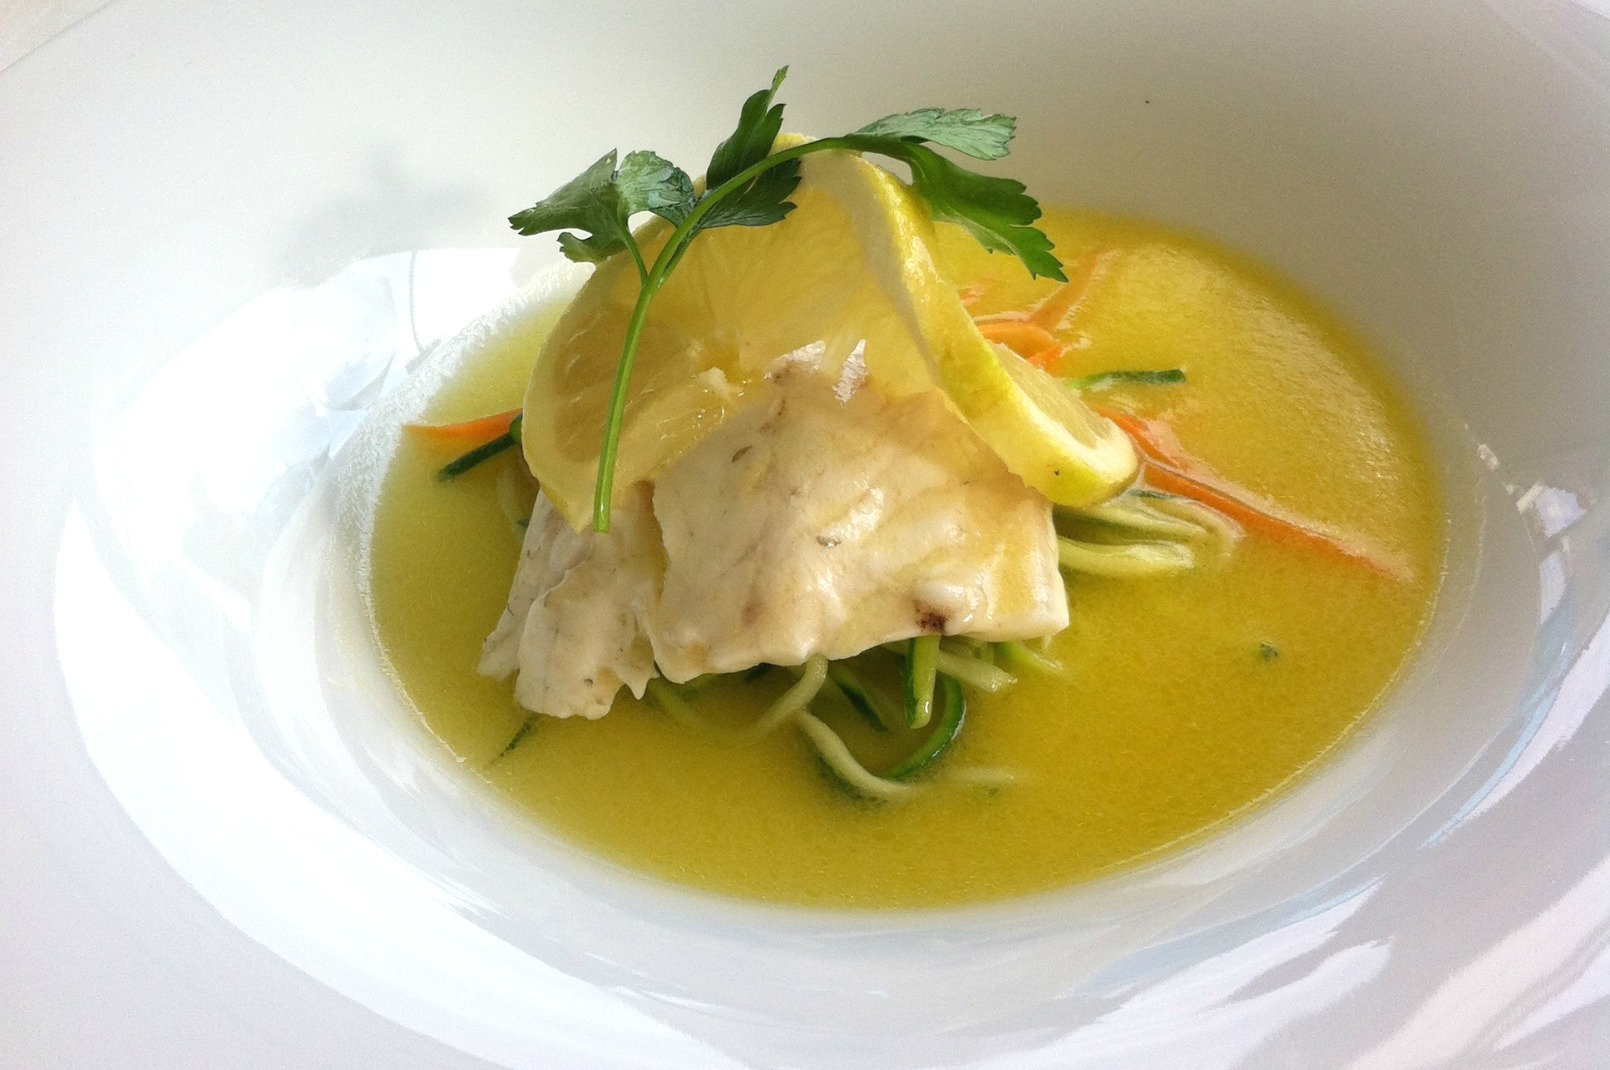 ciao-amalfi-lemons-fish-marina-grande